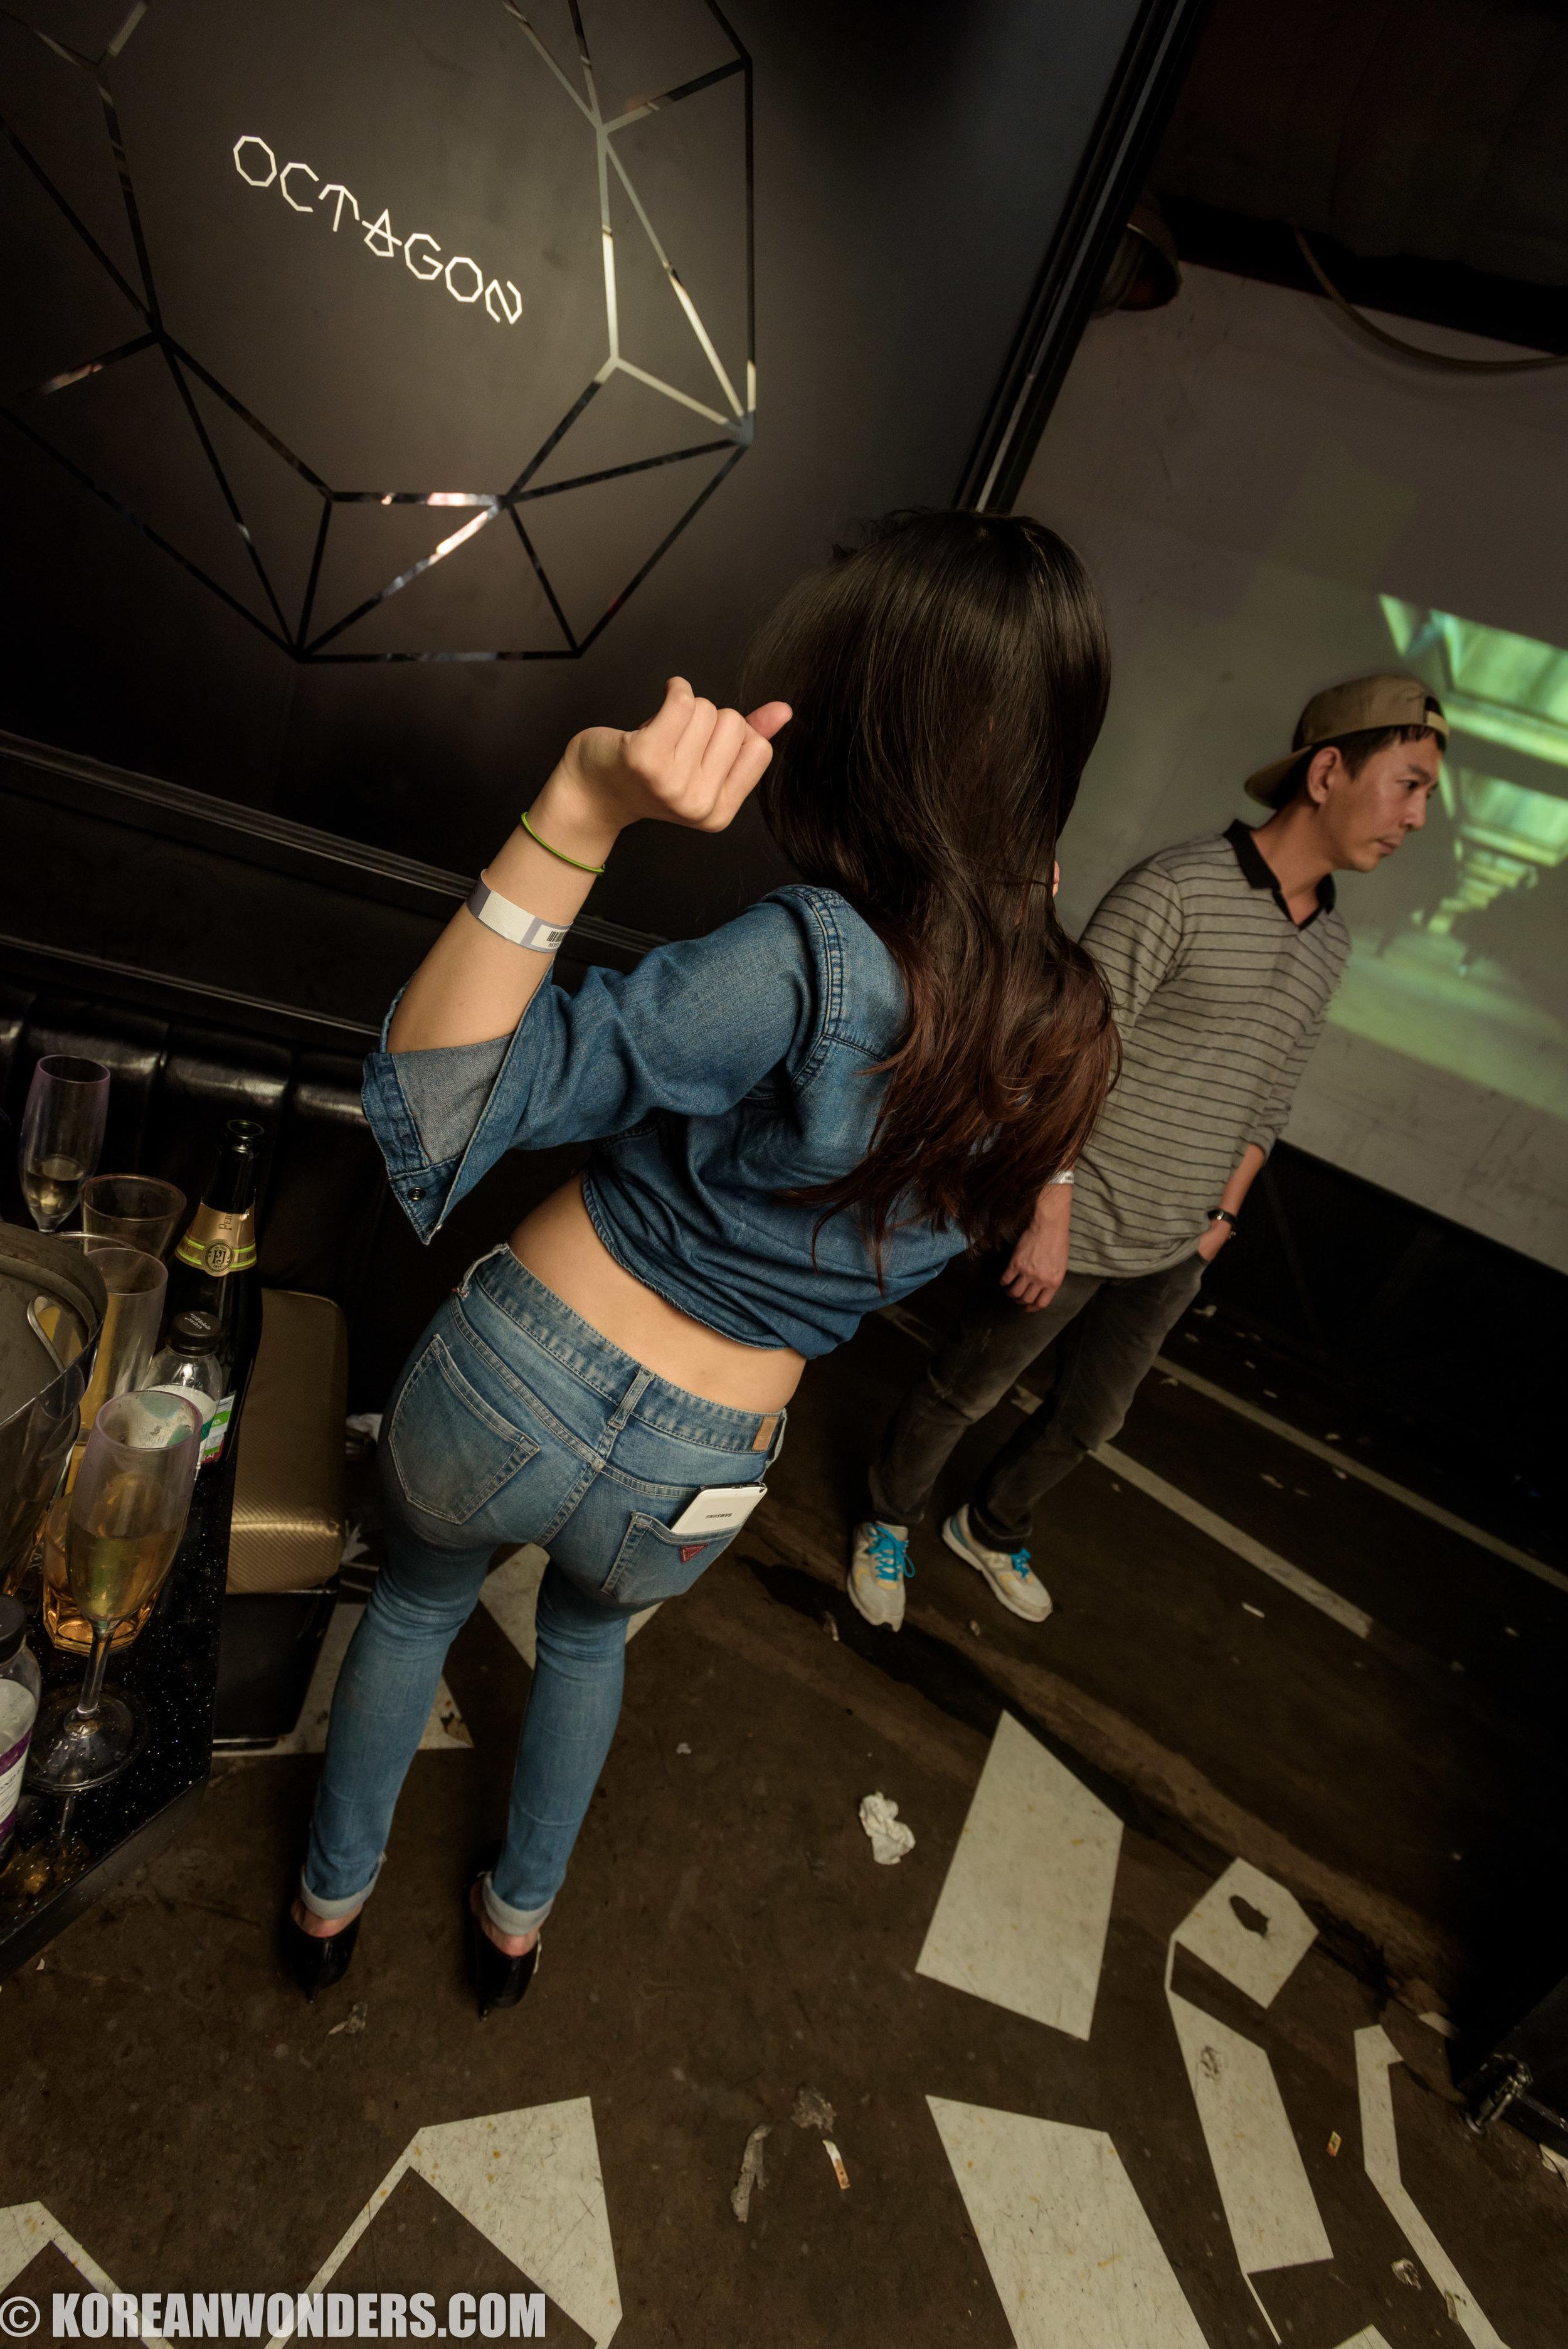 Party at Club Octagon - 2015.10.02 (Fri)